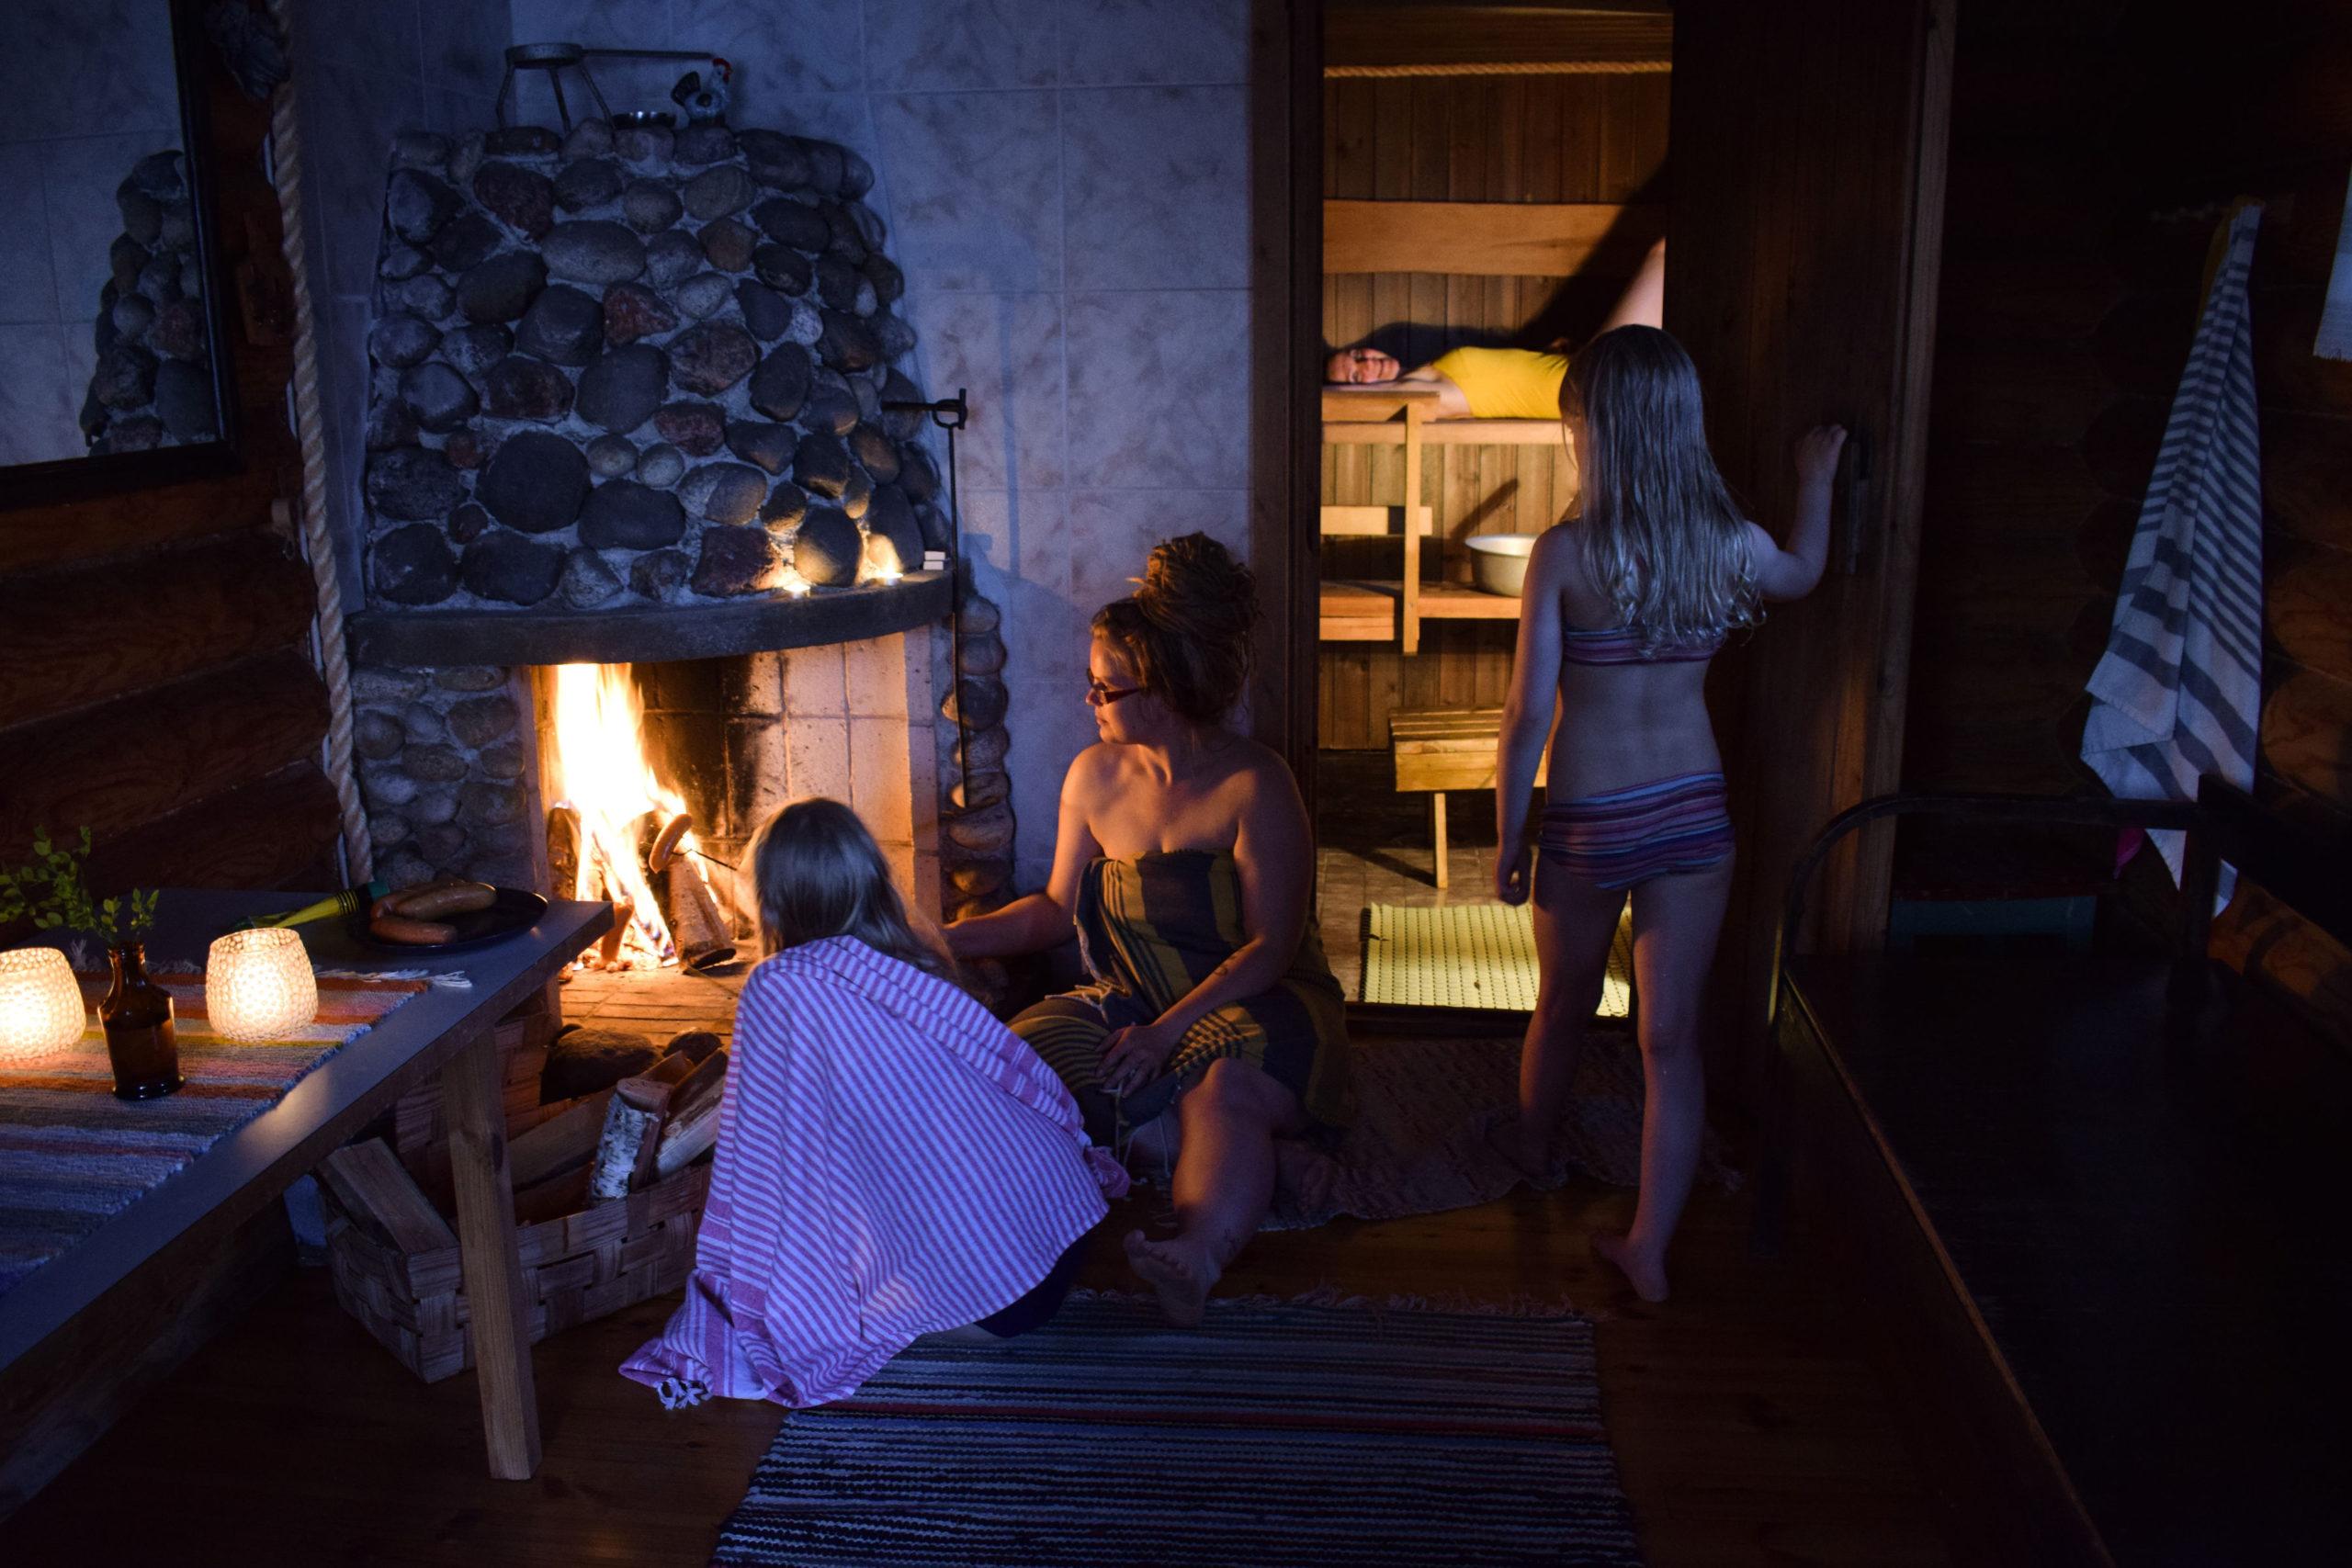 Having wood-heated sauna at Kukkoniemen Lomamökit rental cottages in Punkaharju, Saimaa